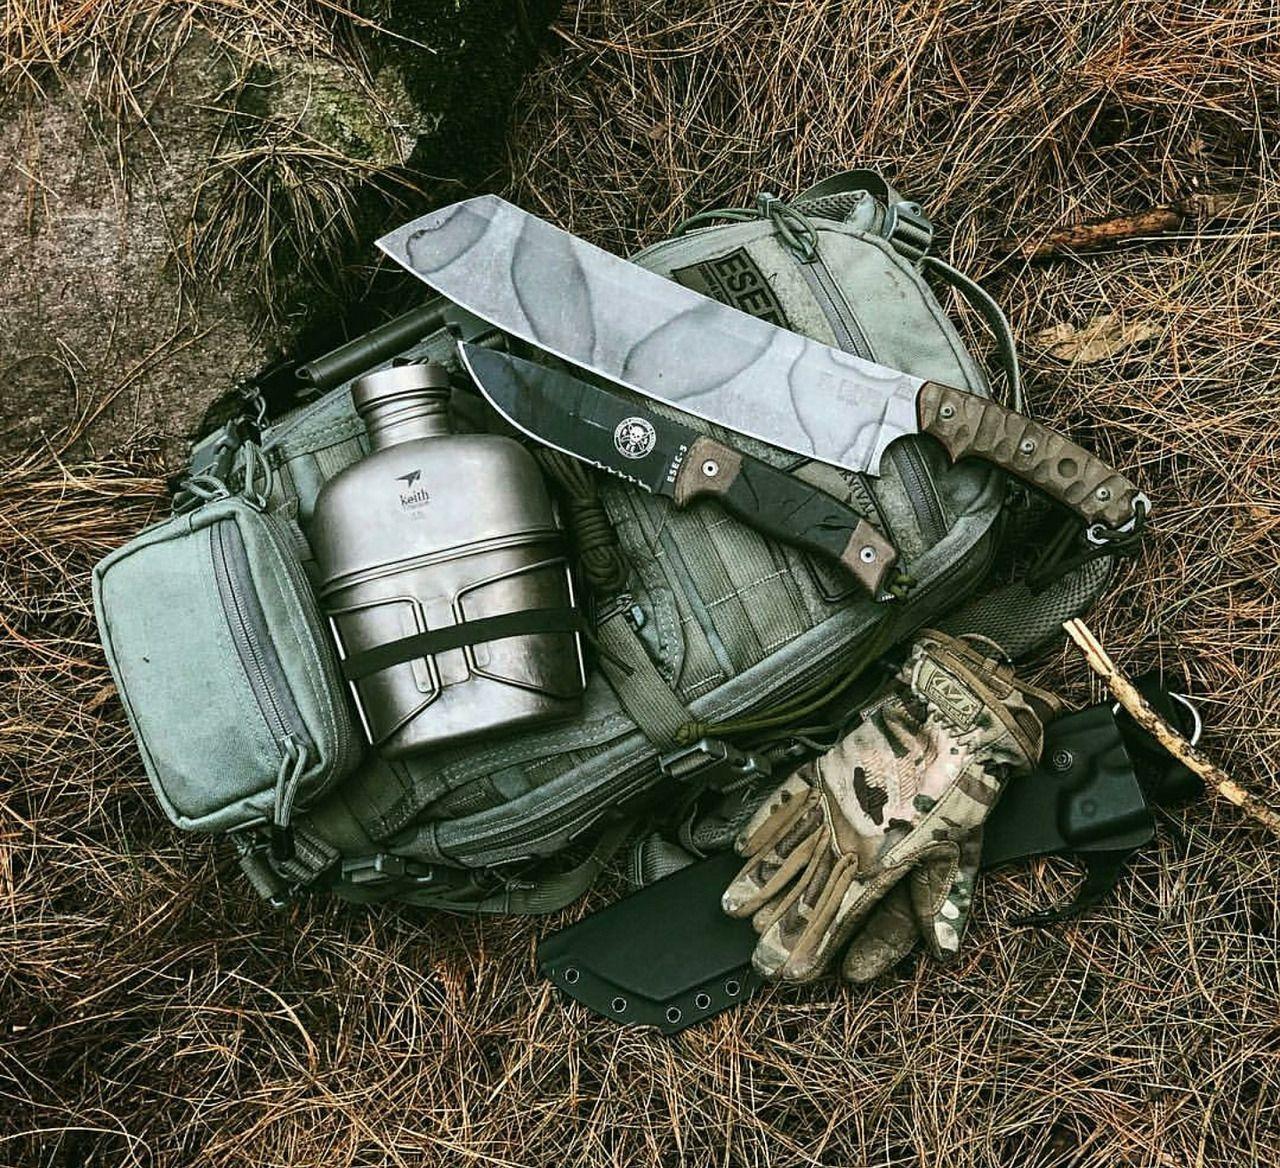 Bushcraft Survival Skills: Bushcraft Kit With The FAST Pack Litespeed...